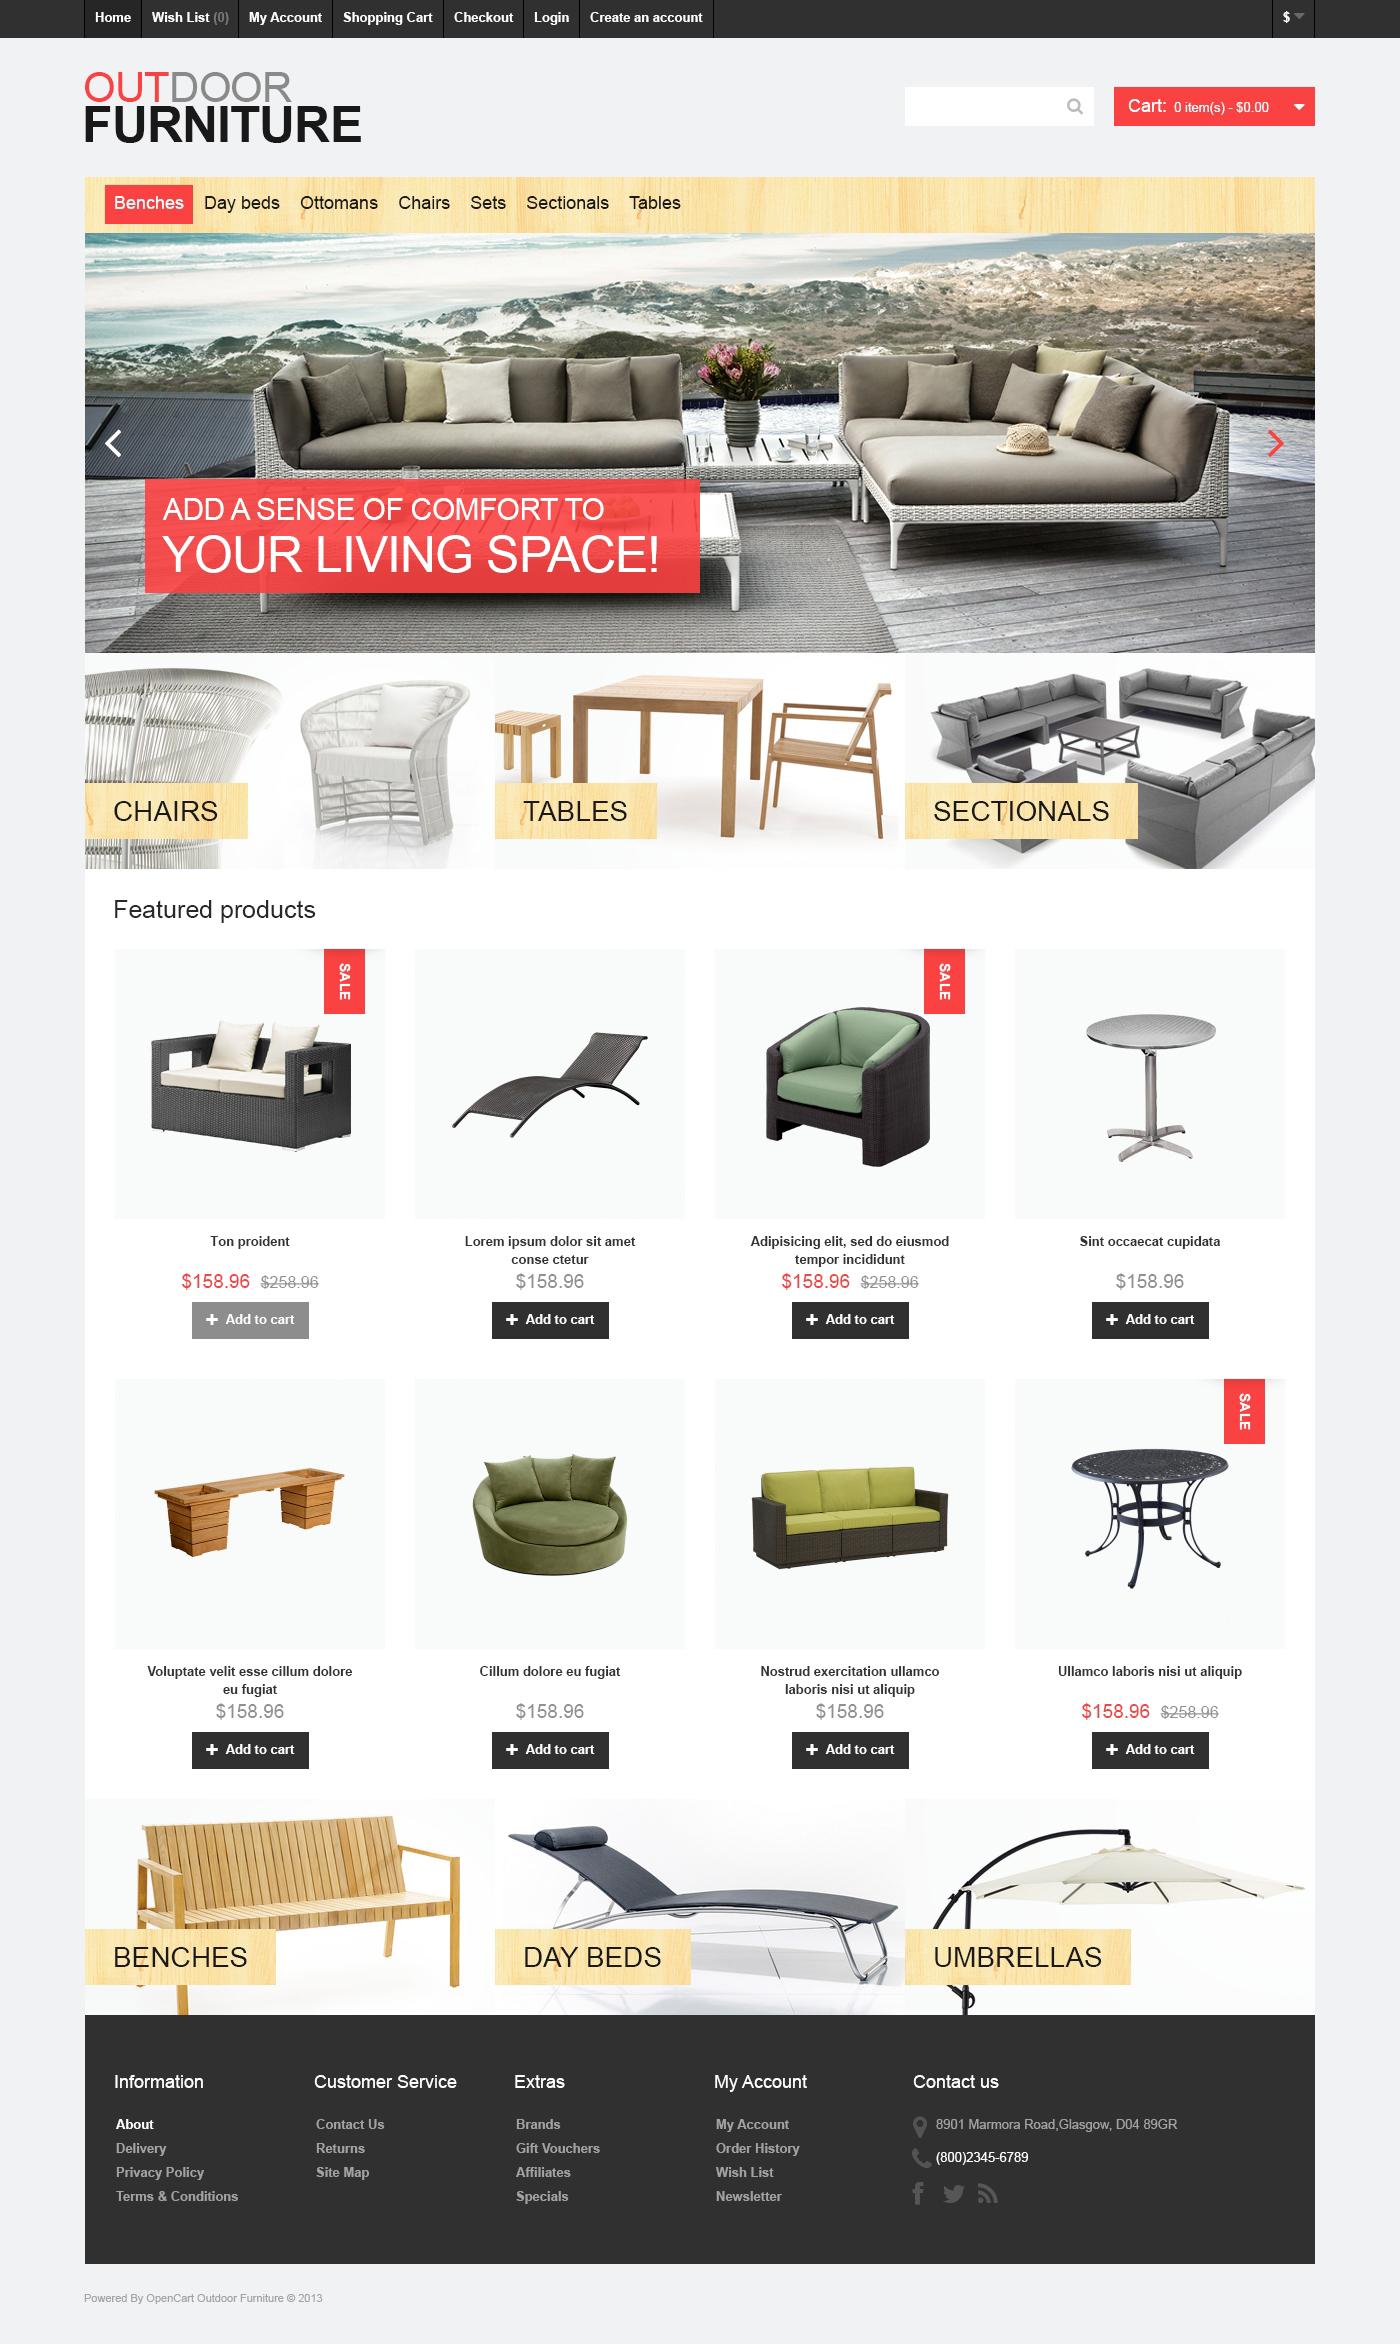 Outdoor Furniture OpenCart Template - screenshot